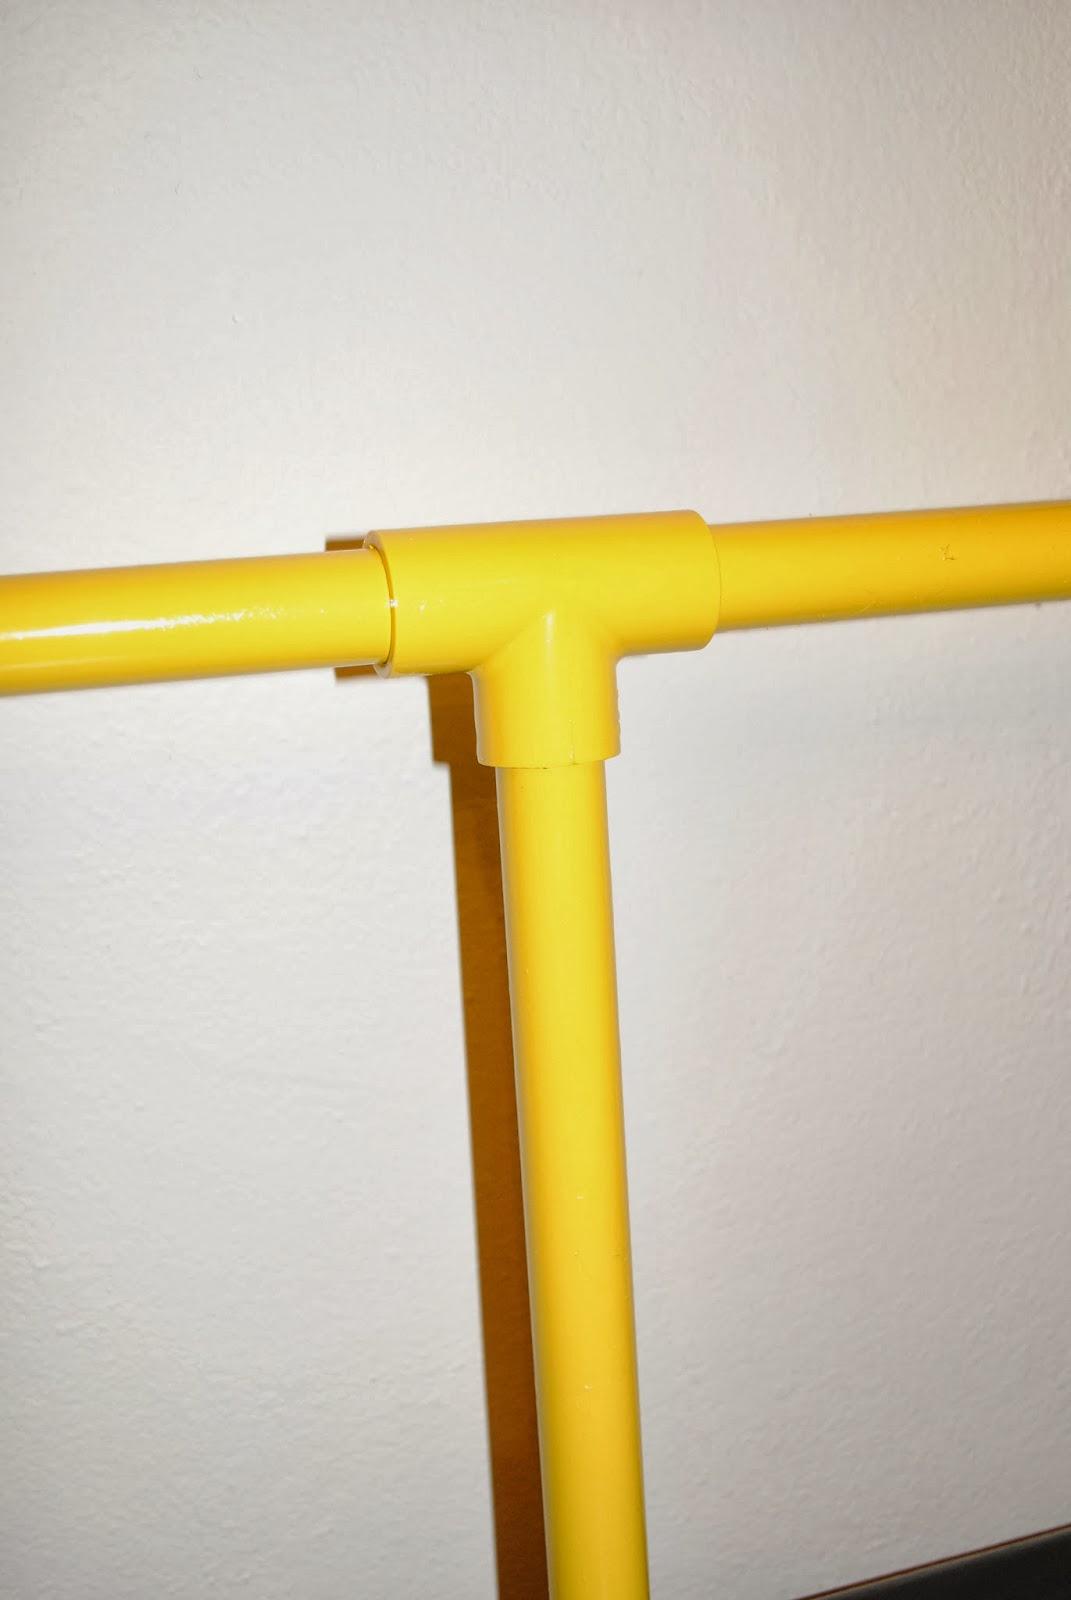 Can You Paint Pvc Pipe - Acpfoto